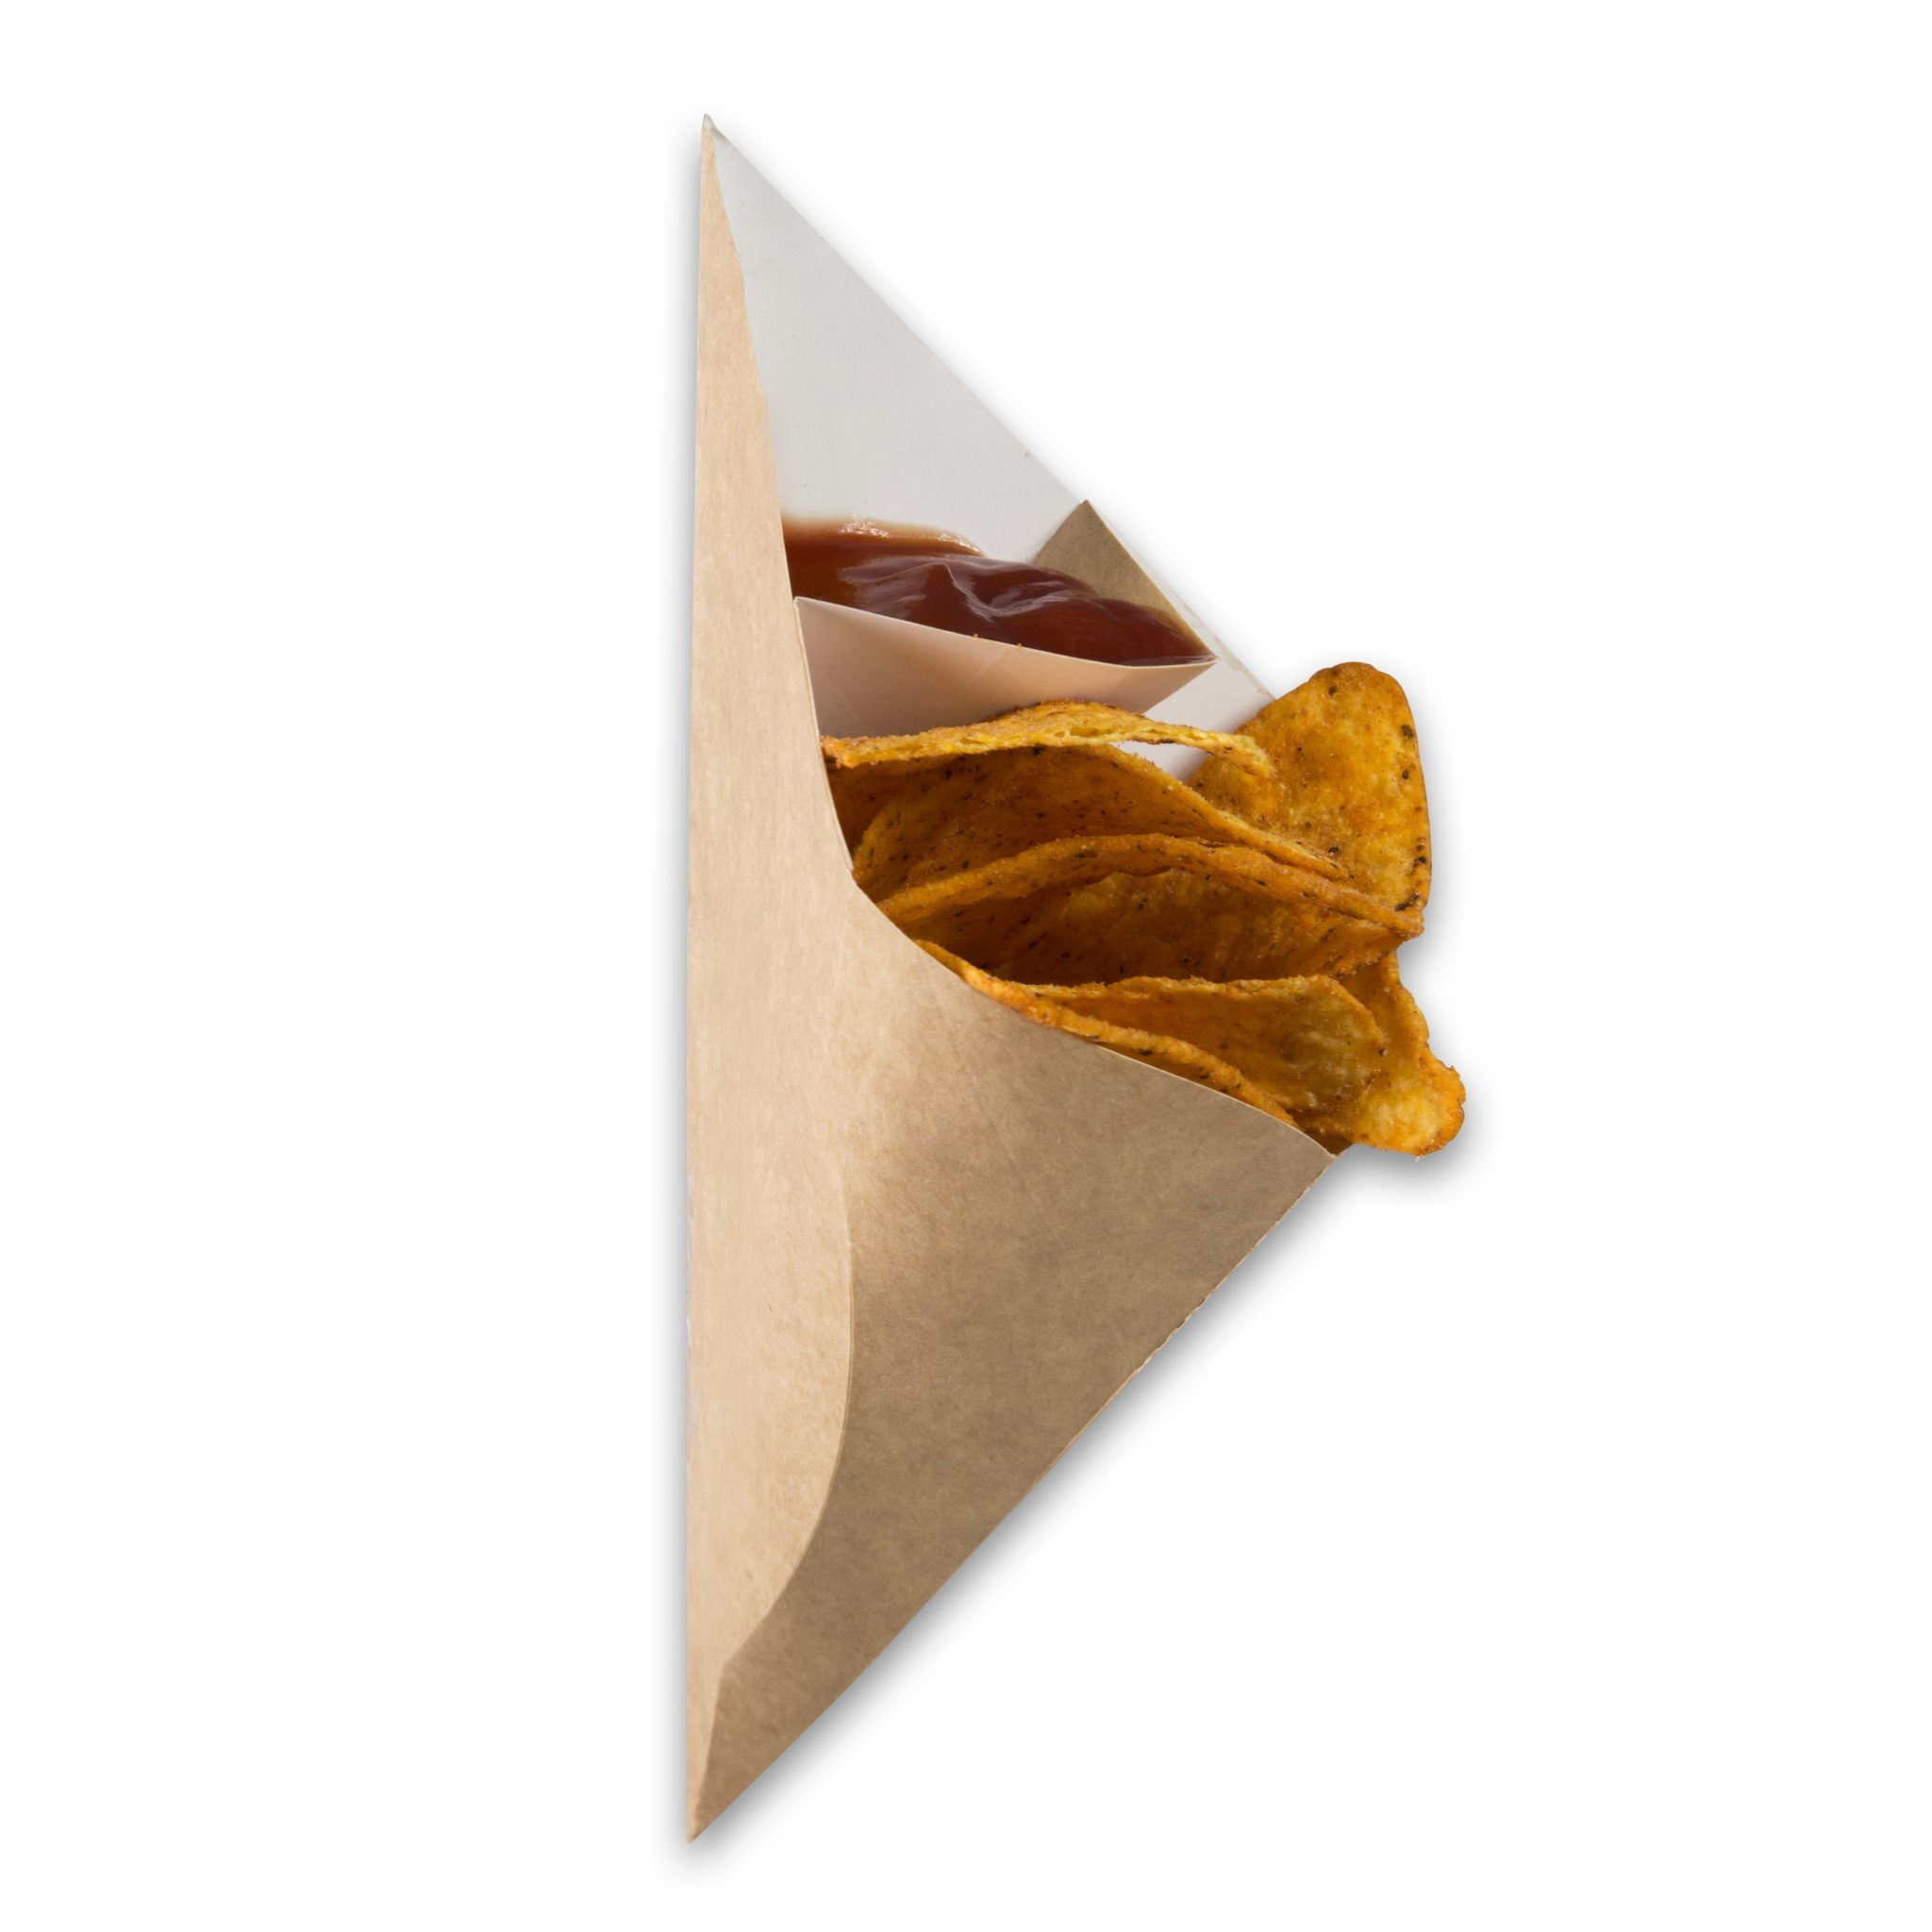 Kraft karton Frietzak met sausvak small 212x164x141 mm snackverpakking Chip 'n Dip klein (6)